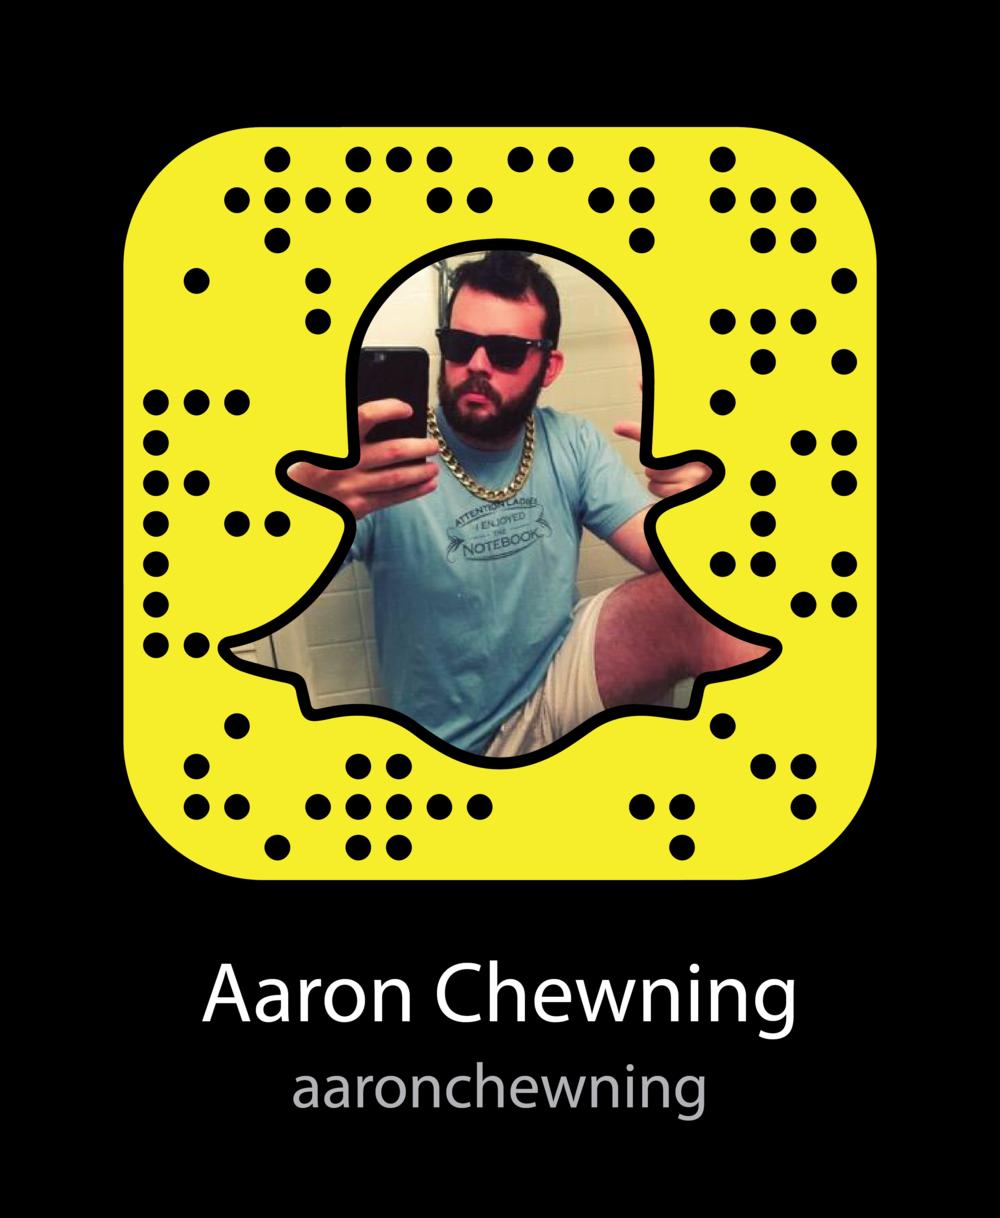 aaron-chewning-vine-celebrity-snapchat-snapcode